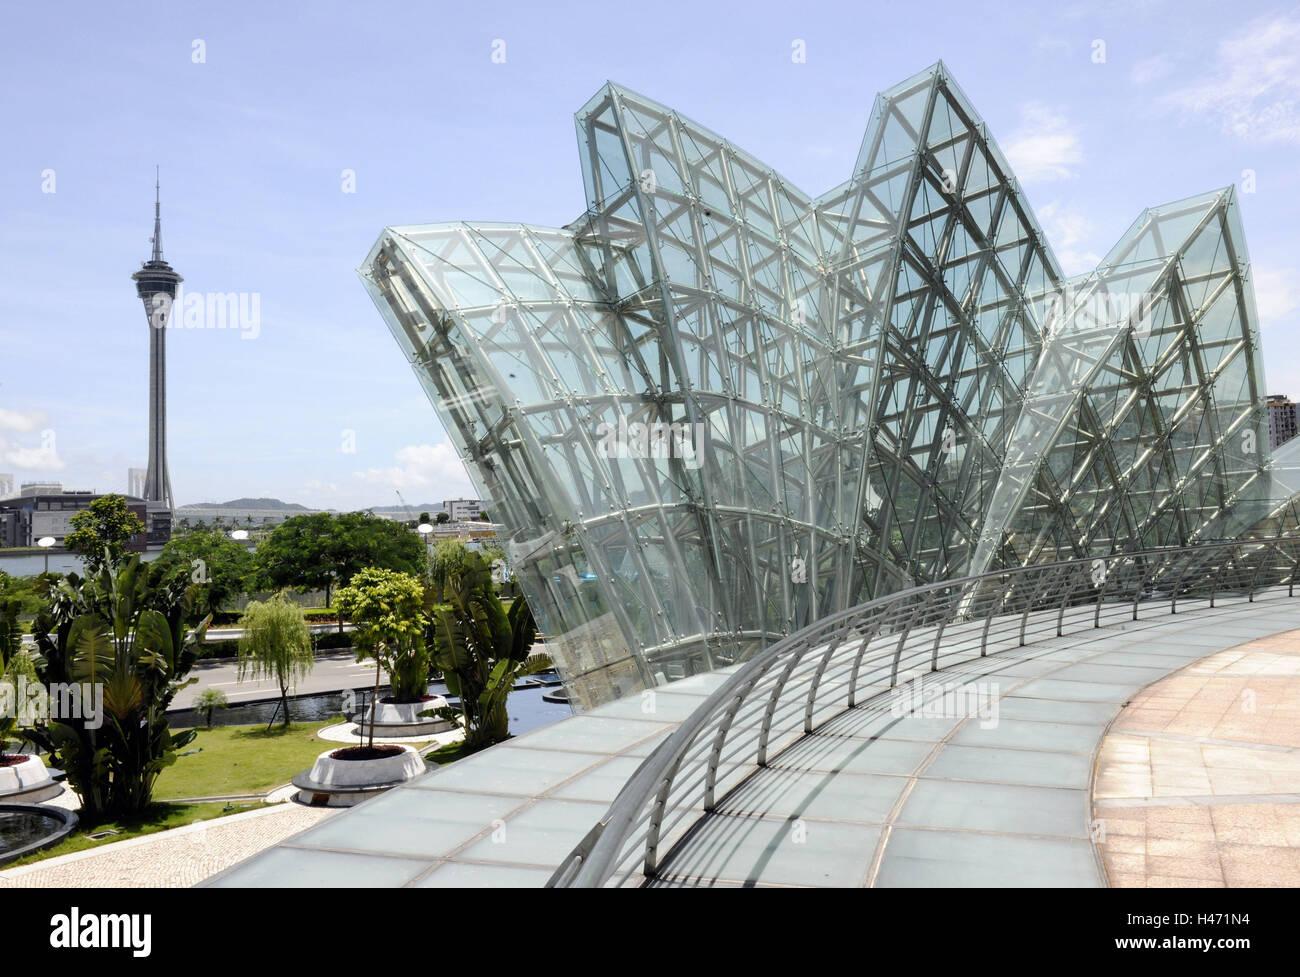 Sending tower, terrace, palms, glass construction, railing, Macau, China, - Stock Image